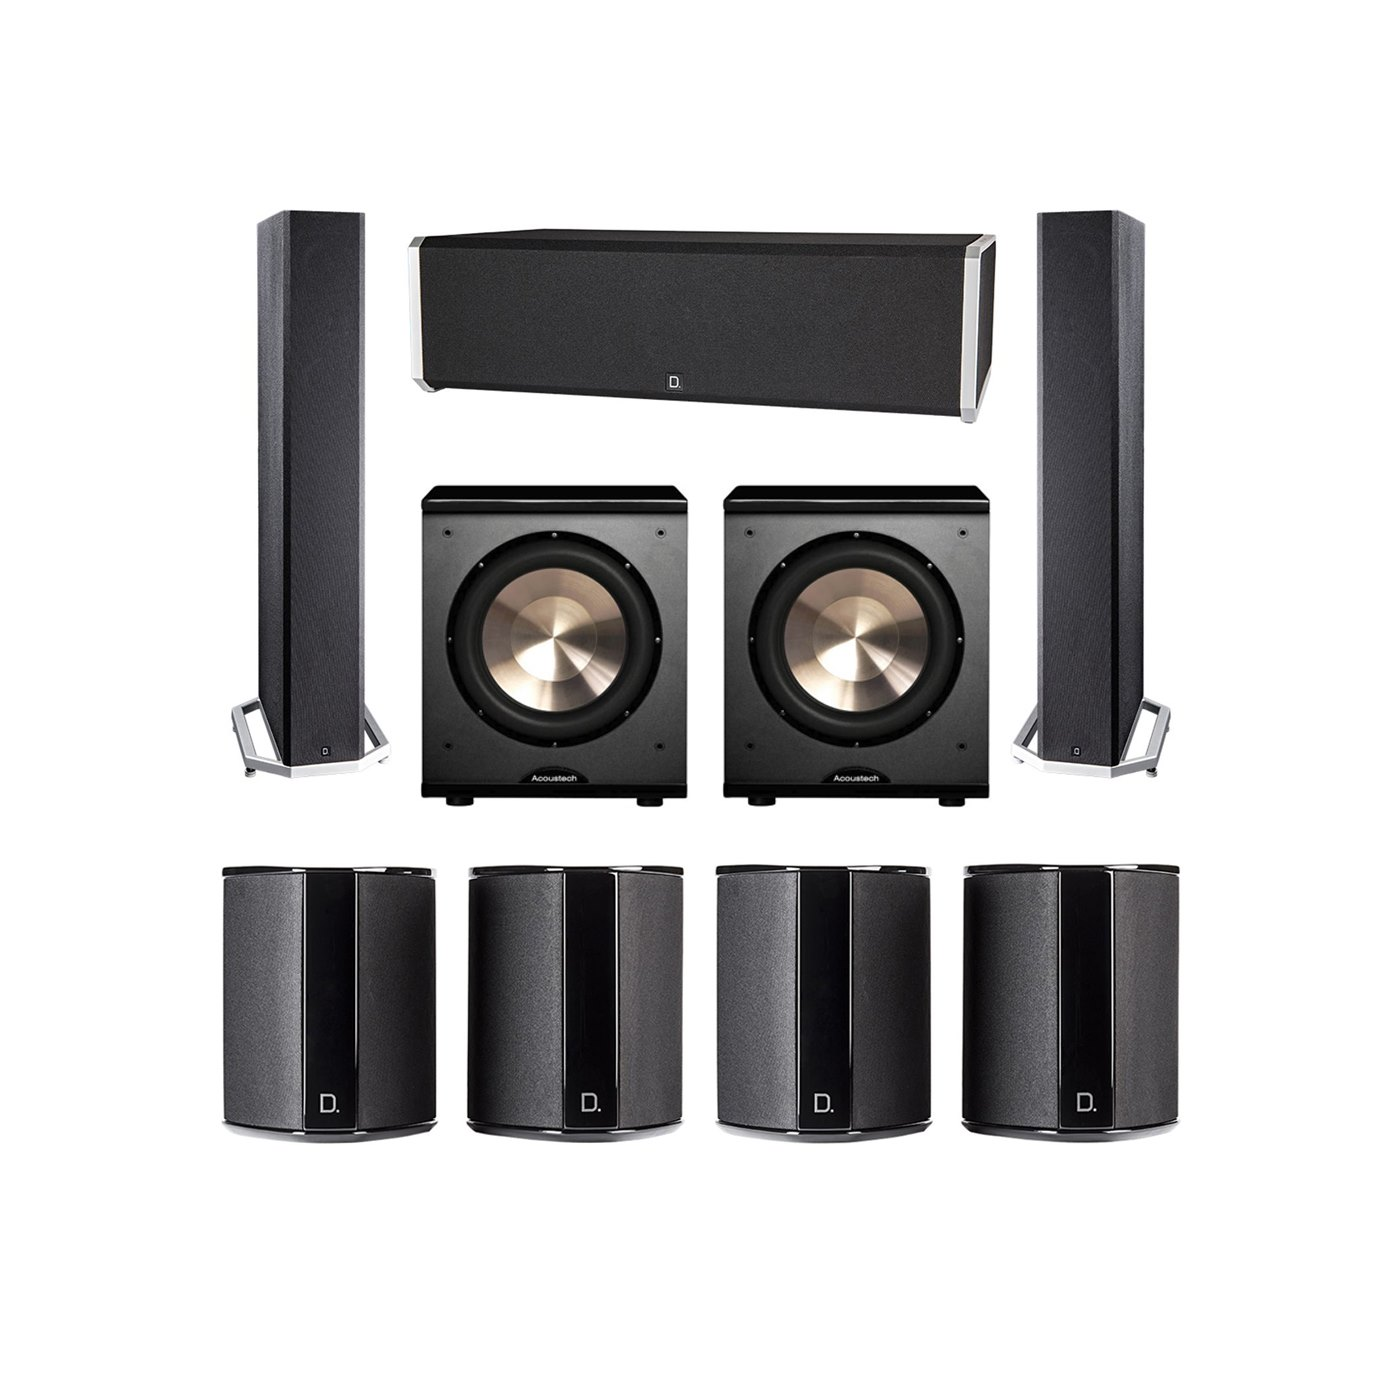 Definitive Technology 7.2 System with 2 BP9040 Tower Speakers, 1 CS9040 Center Channel Speaker, 4 SR9040 Surround Speaker, 2 BIC PL-200 Subwoofer